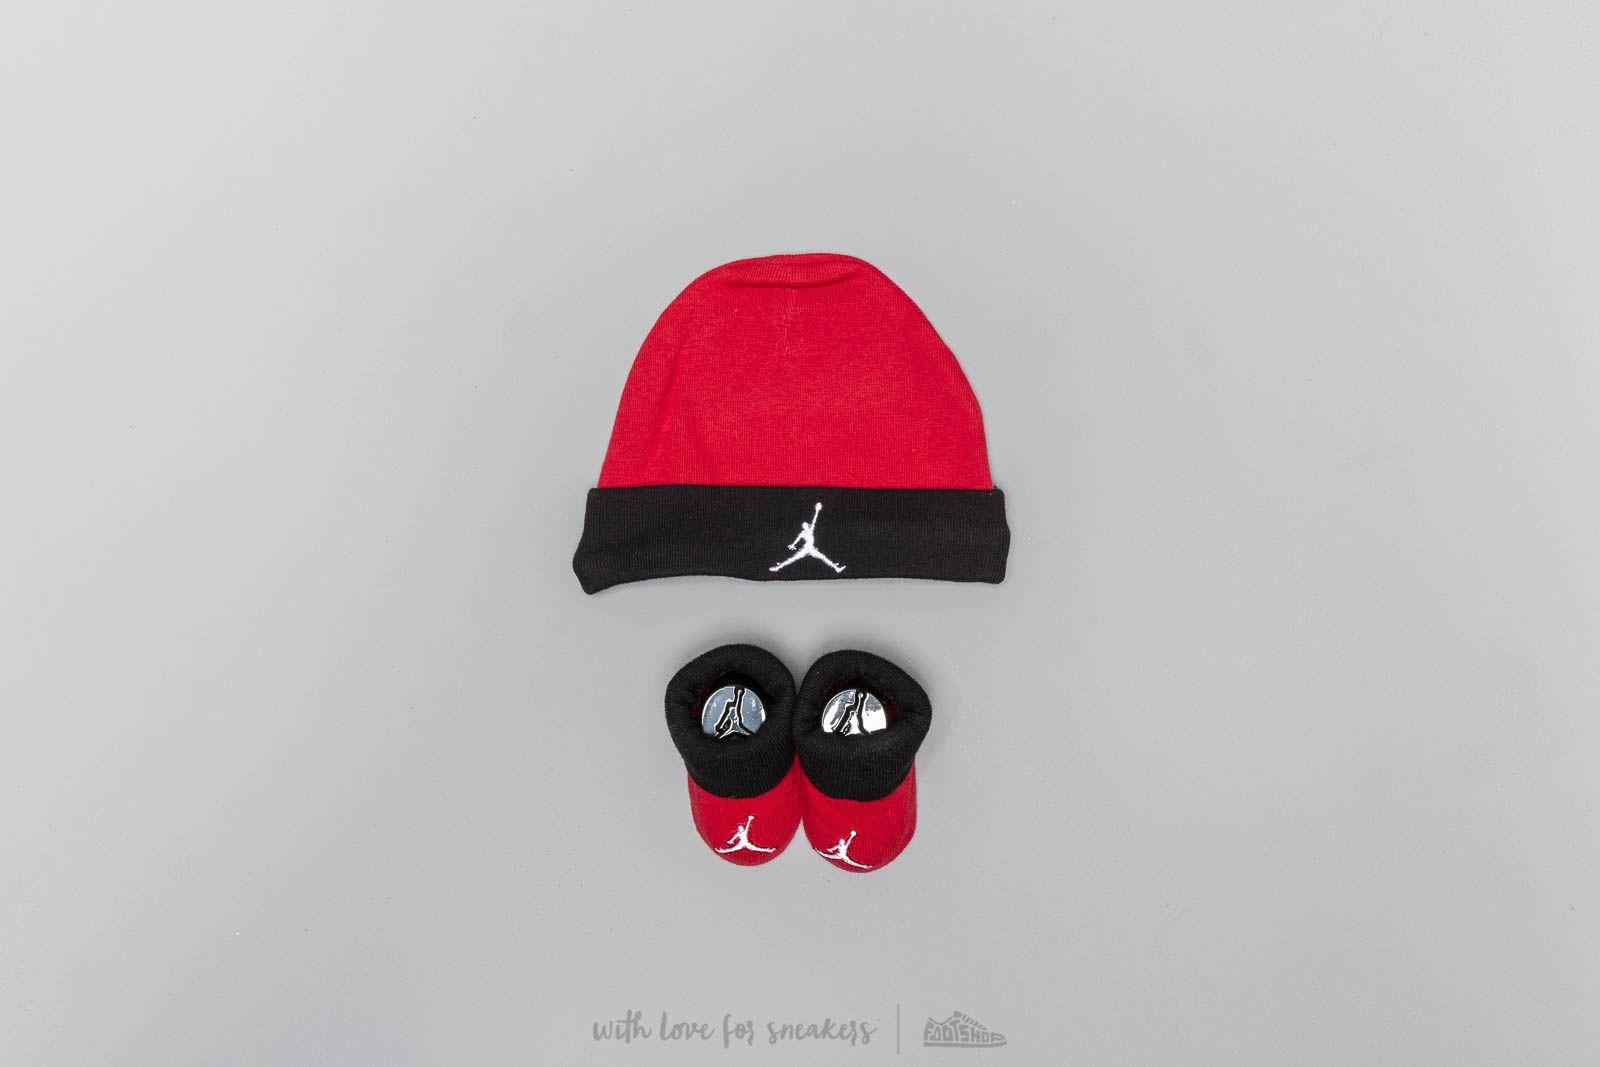 d9c8ce479b9 Jordan Infant Baby Set Black/ Red at a great price 30 лв купете в Footshop